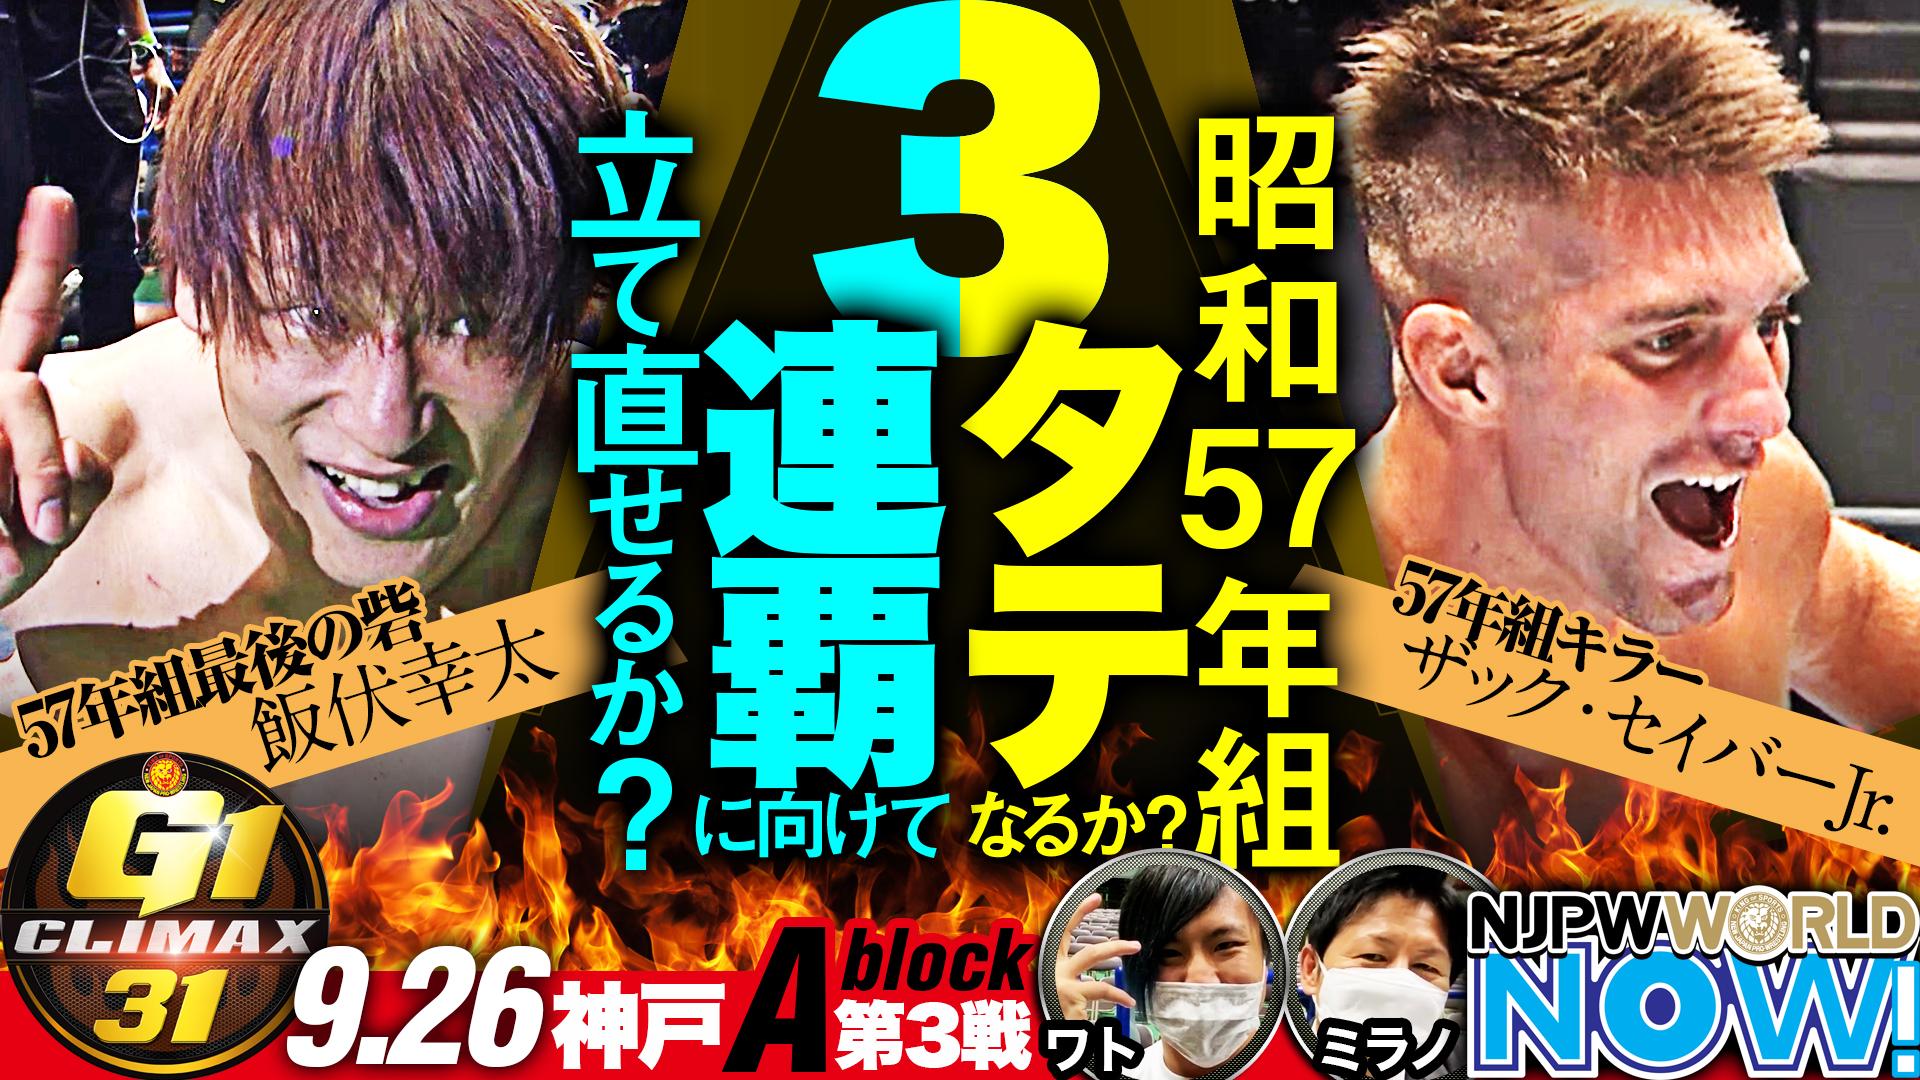 『G1神戸大会』メインは、飯伏vsザック❗️ワト&ミラノが徹底解説‼️